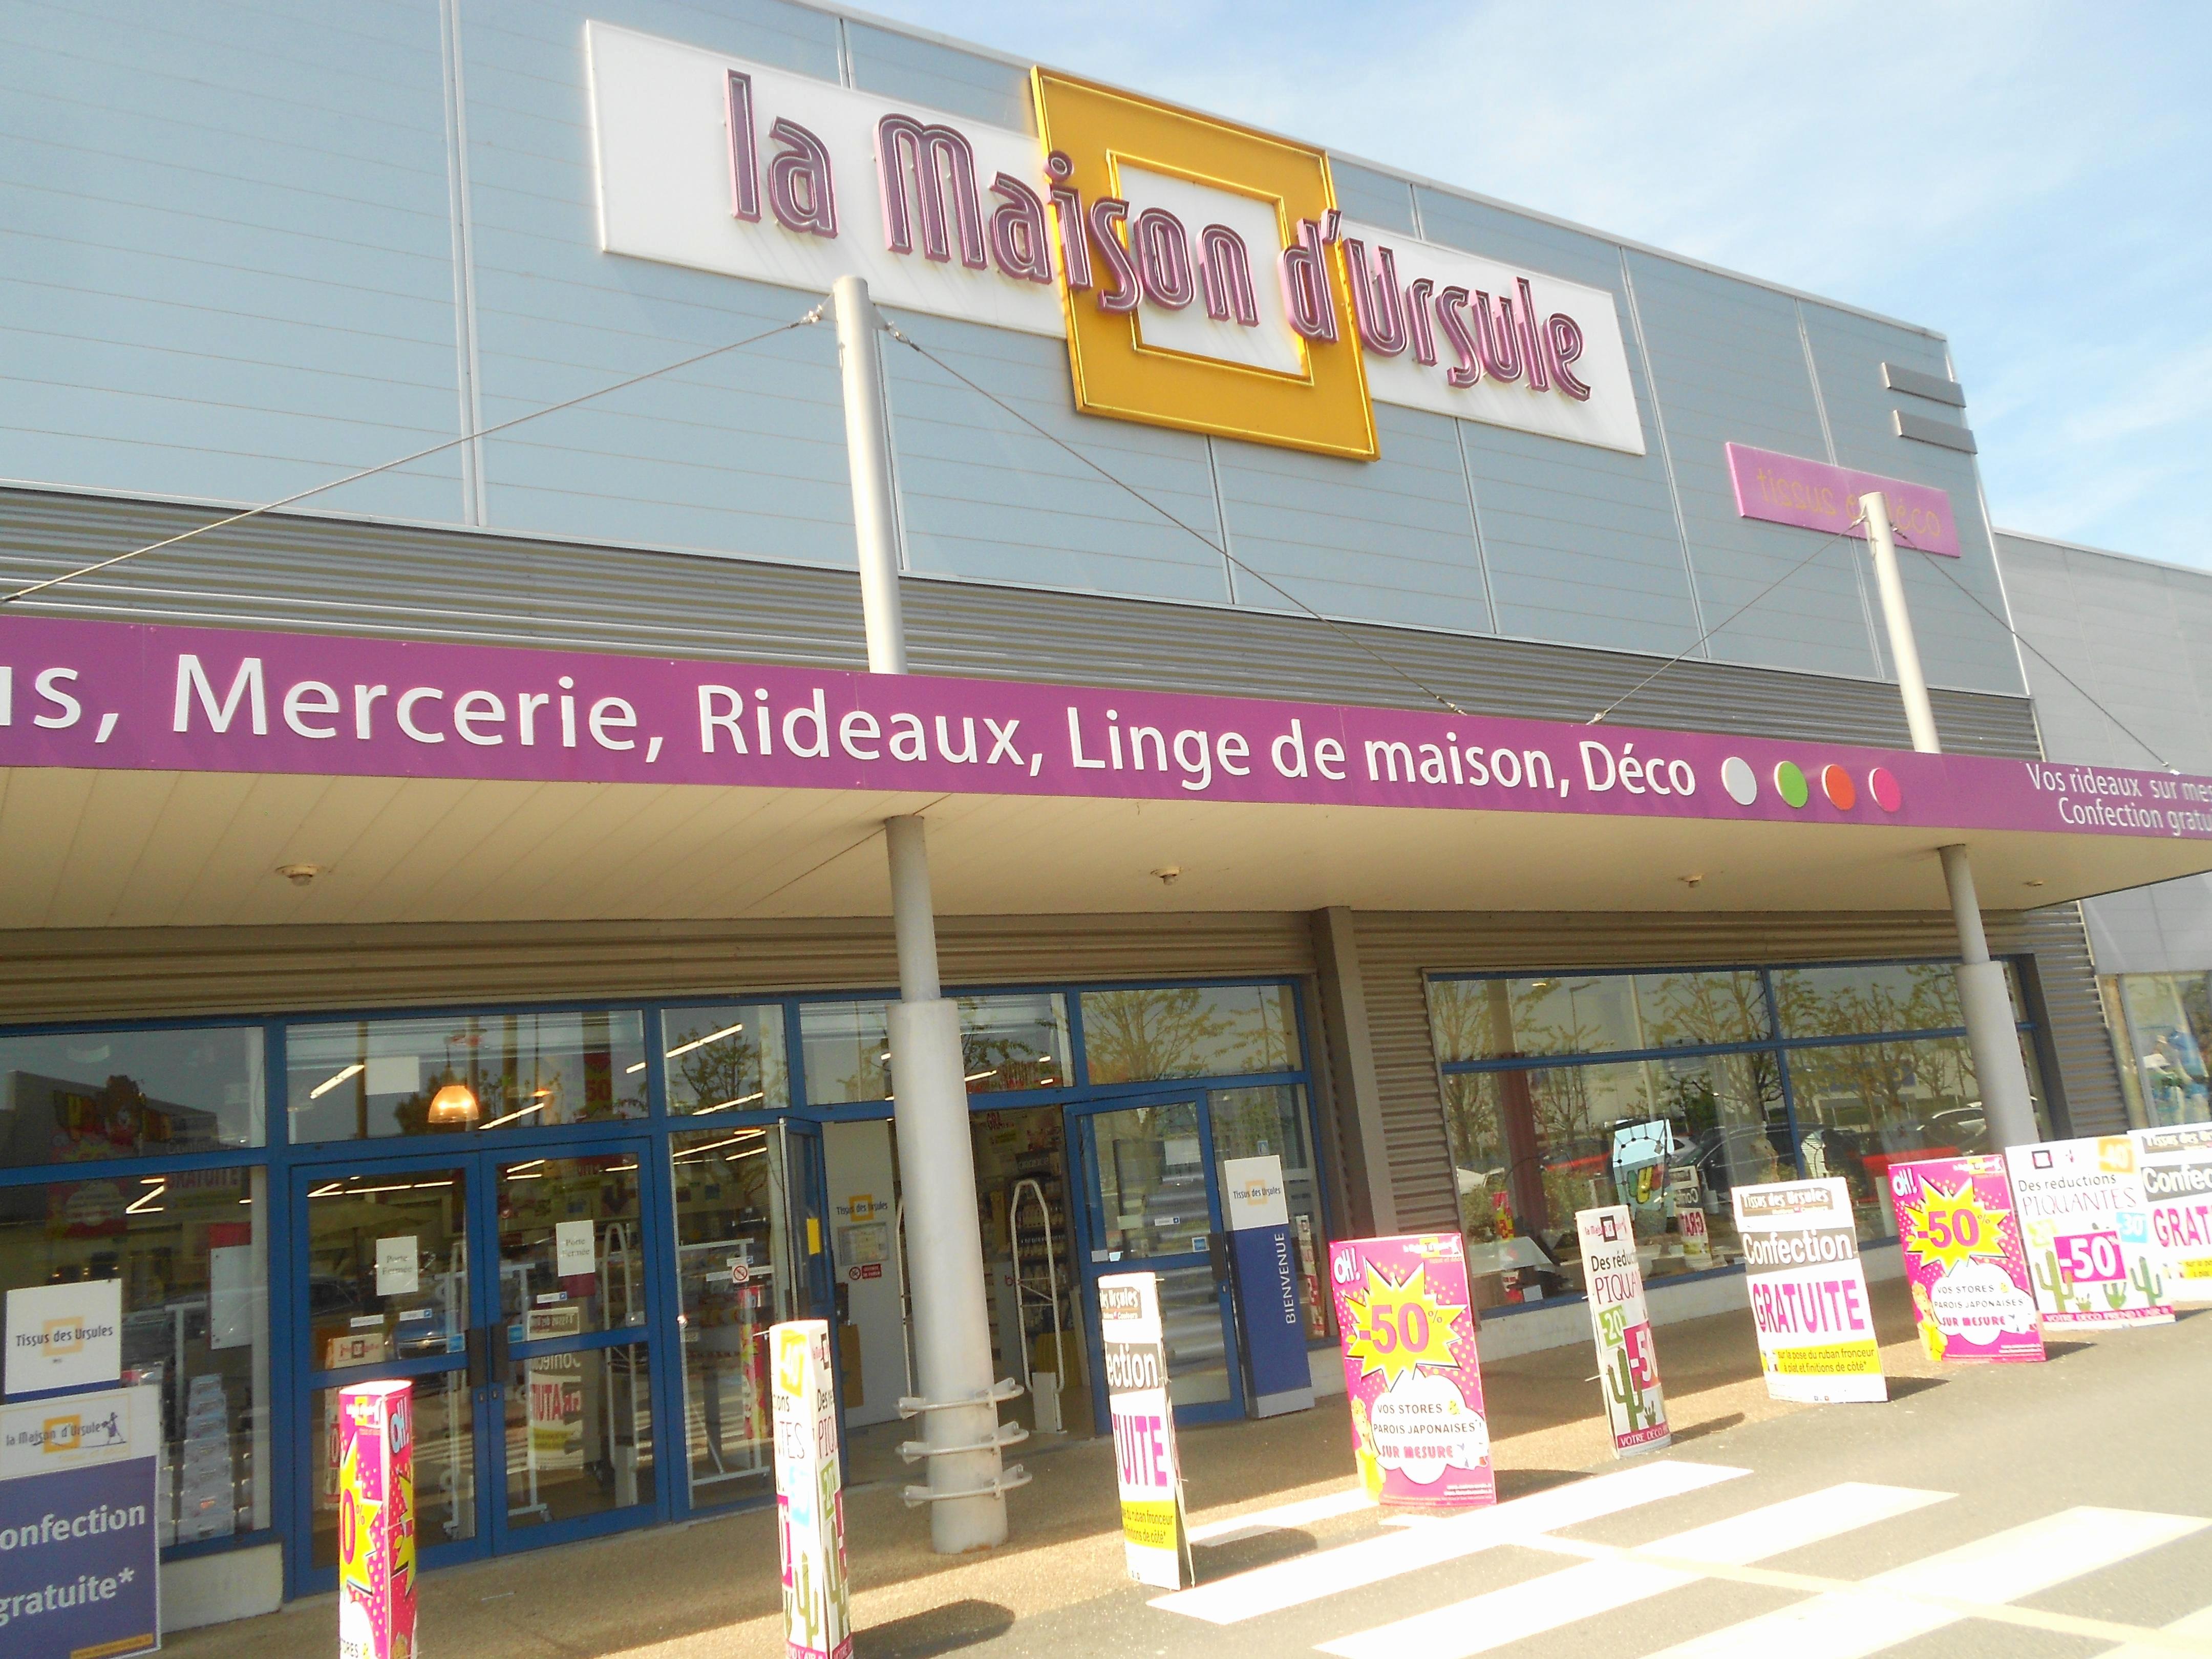 Echelle De Meunier Leroy Merlin Beau Photos Escalier Colima§on Leroy Merlin  La Maison D Ursule Claye souilly